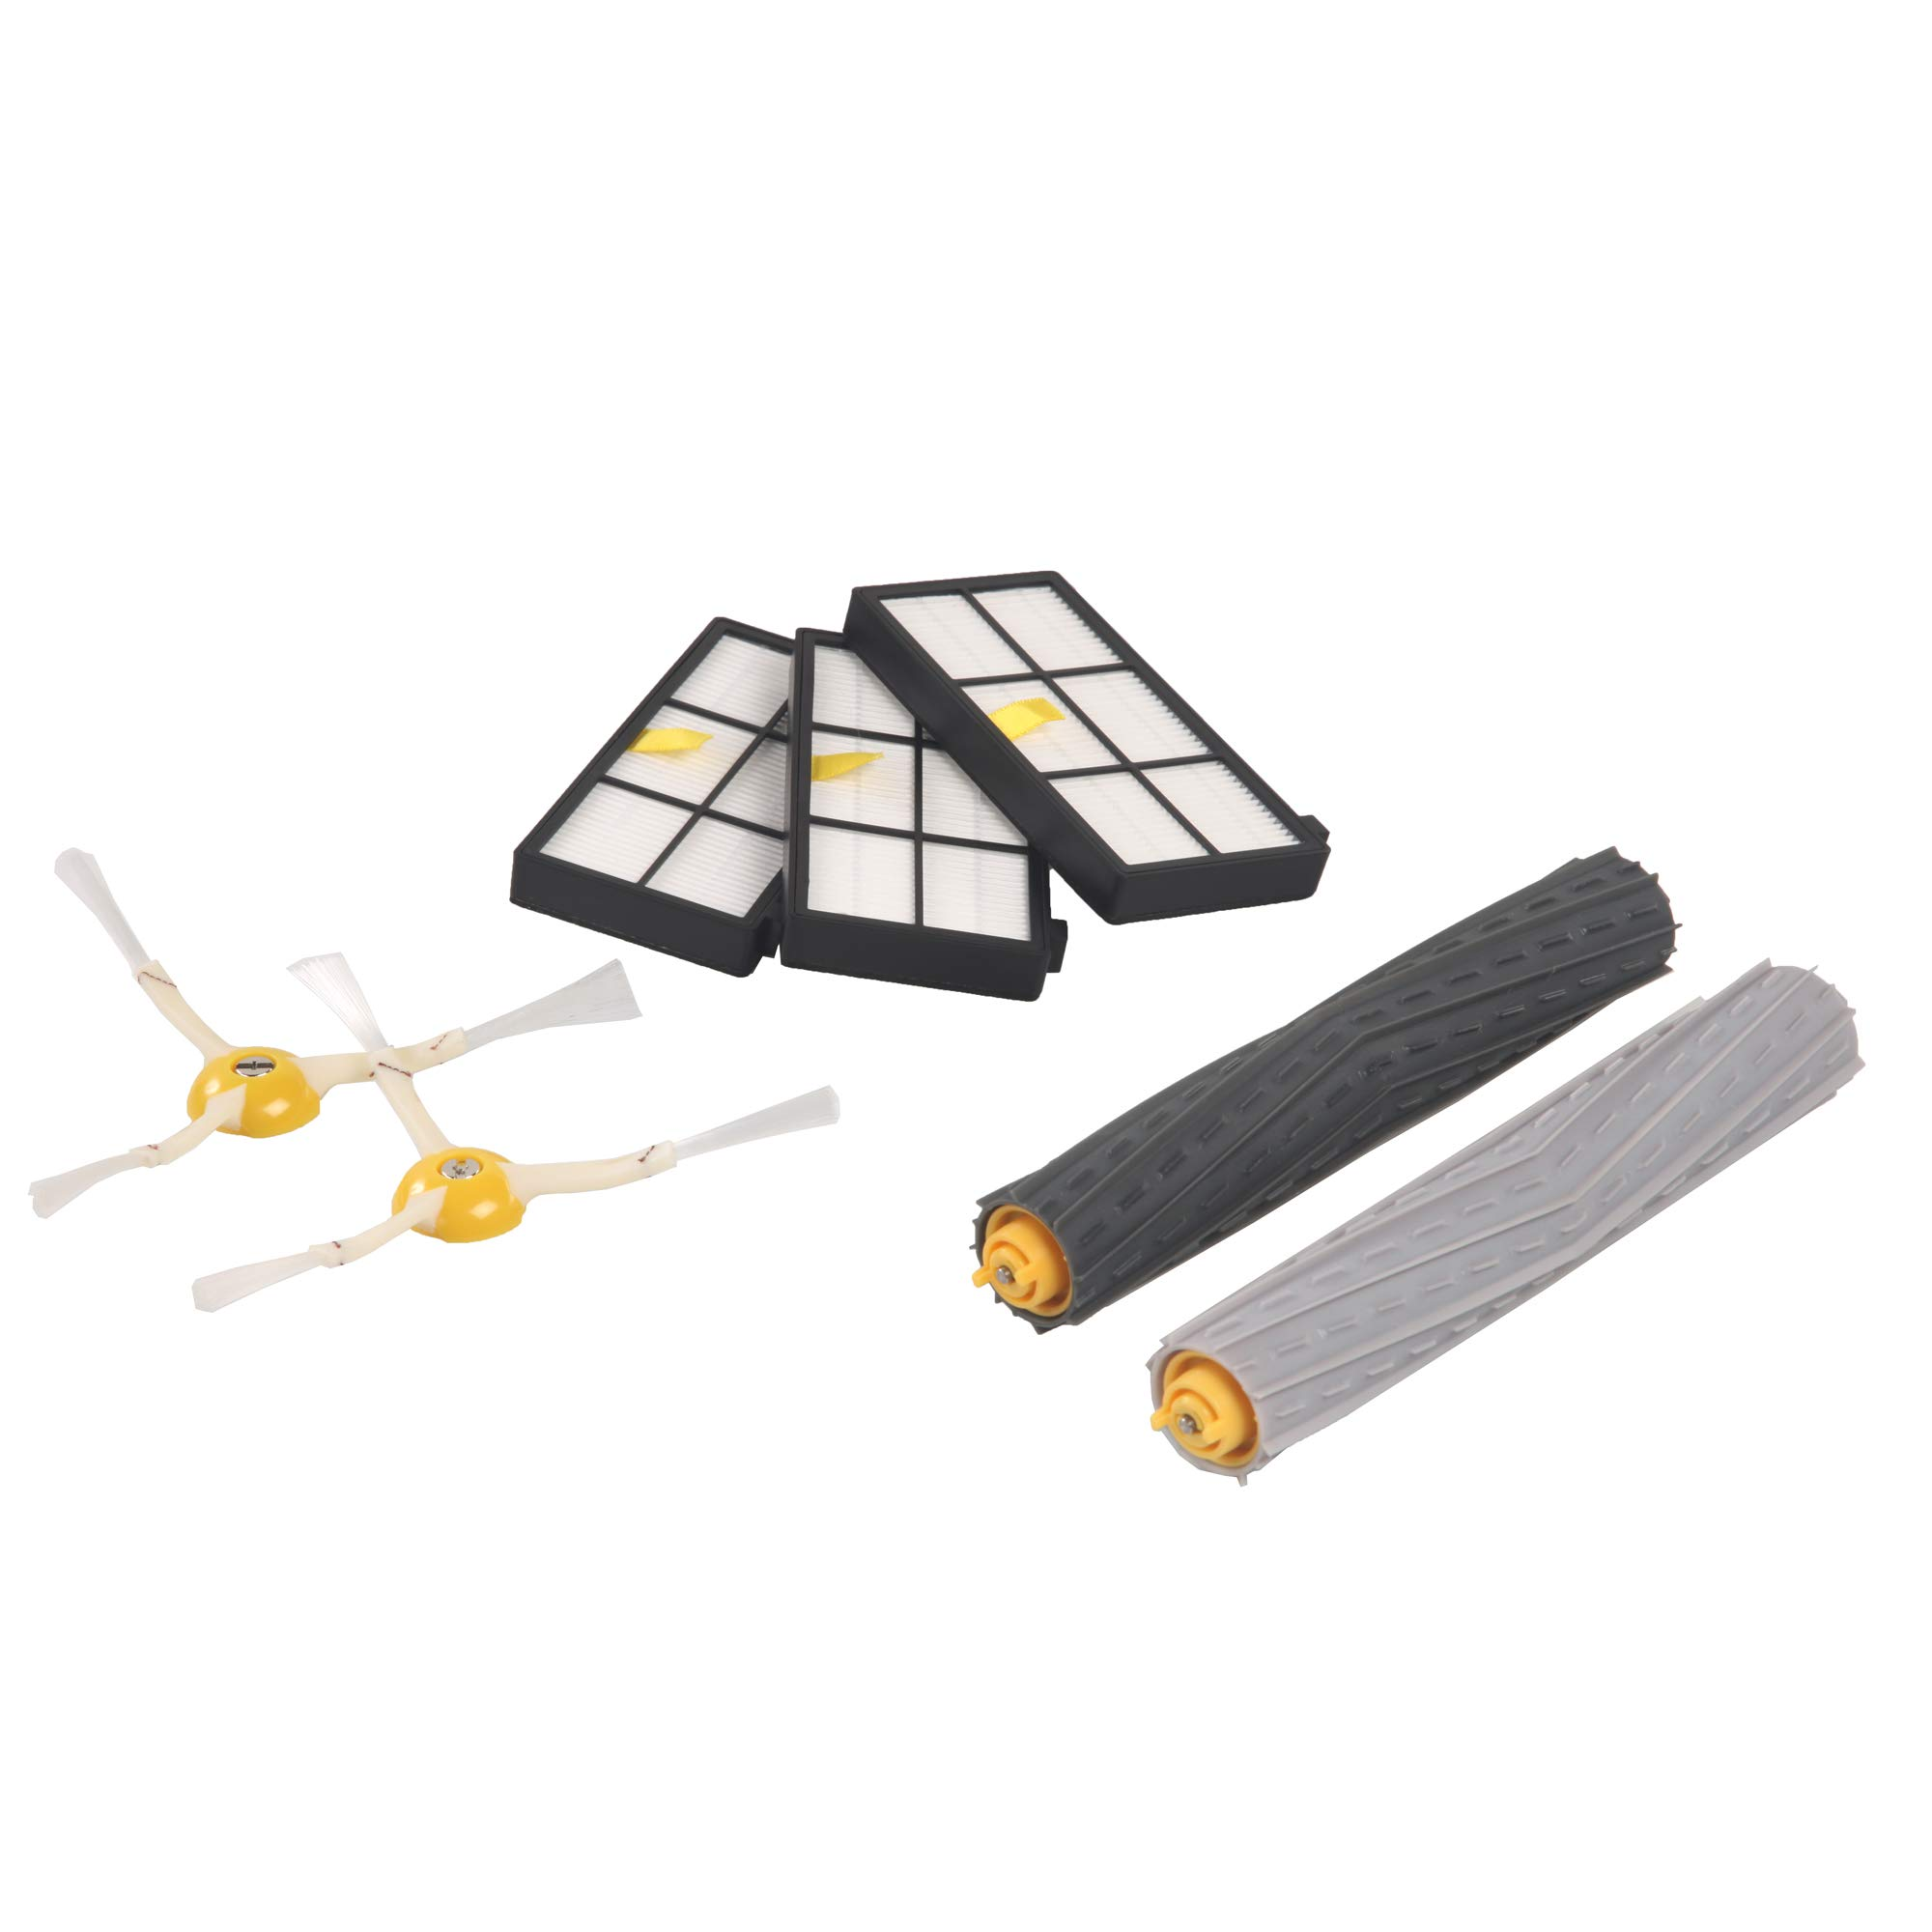 iRobot Roomba 800 and 900 Series Replenishment Kit Accessories, White